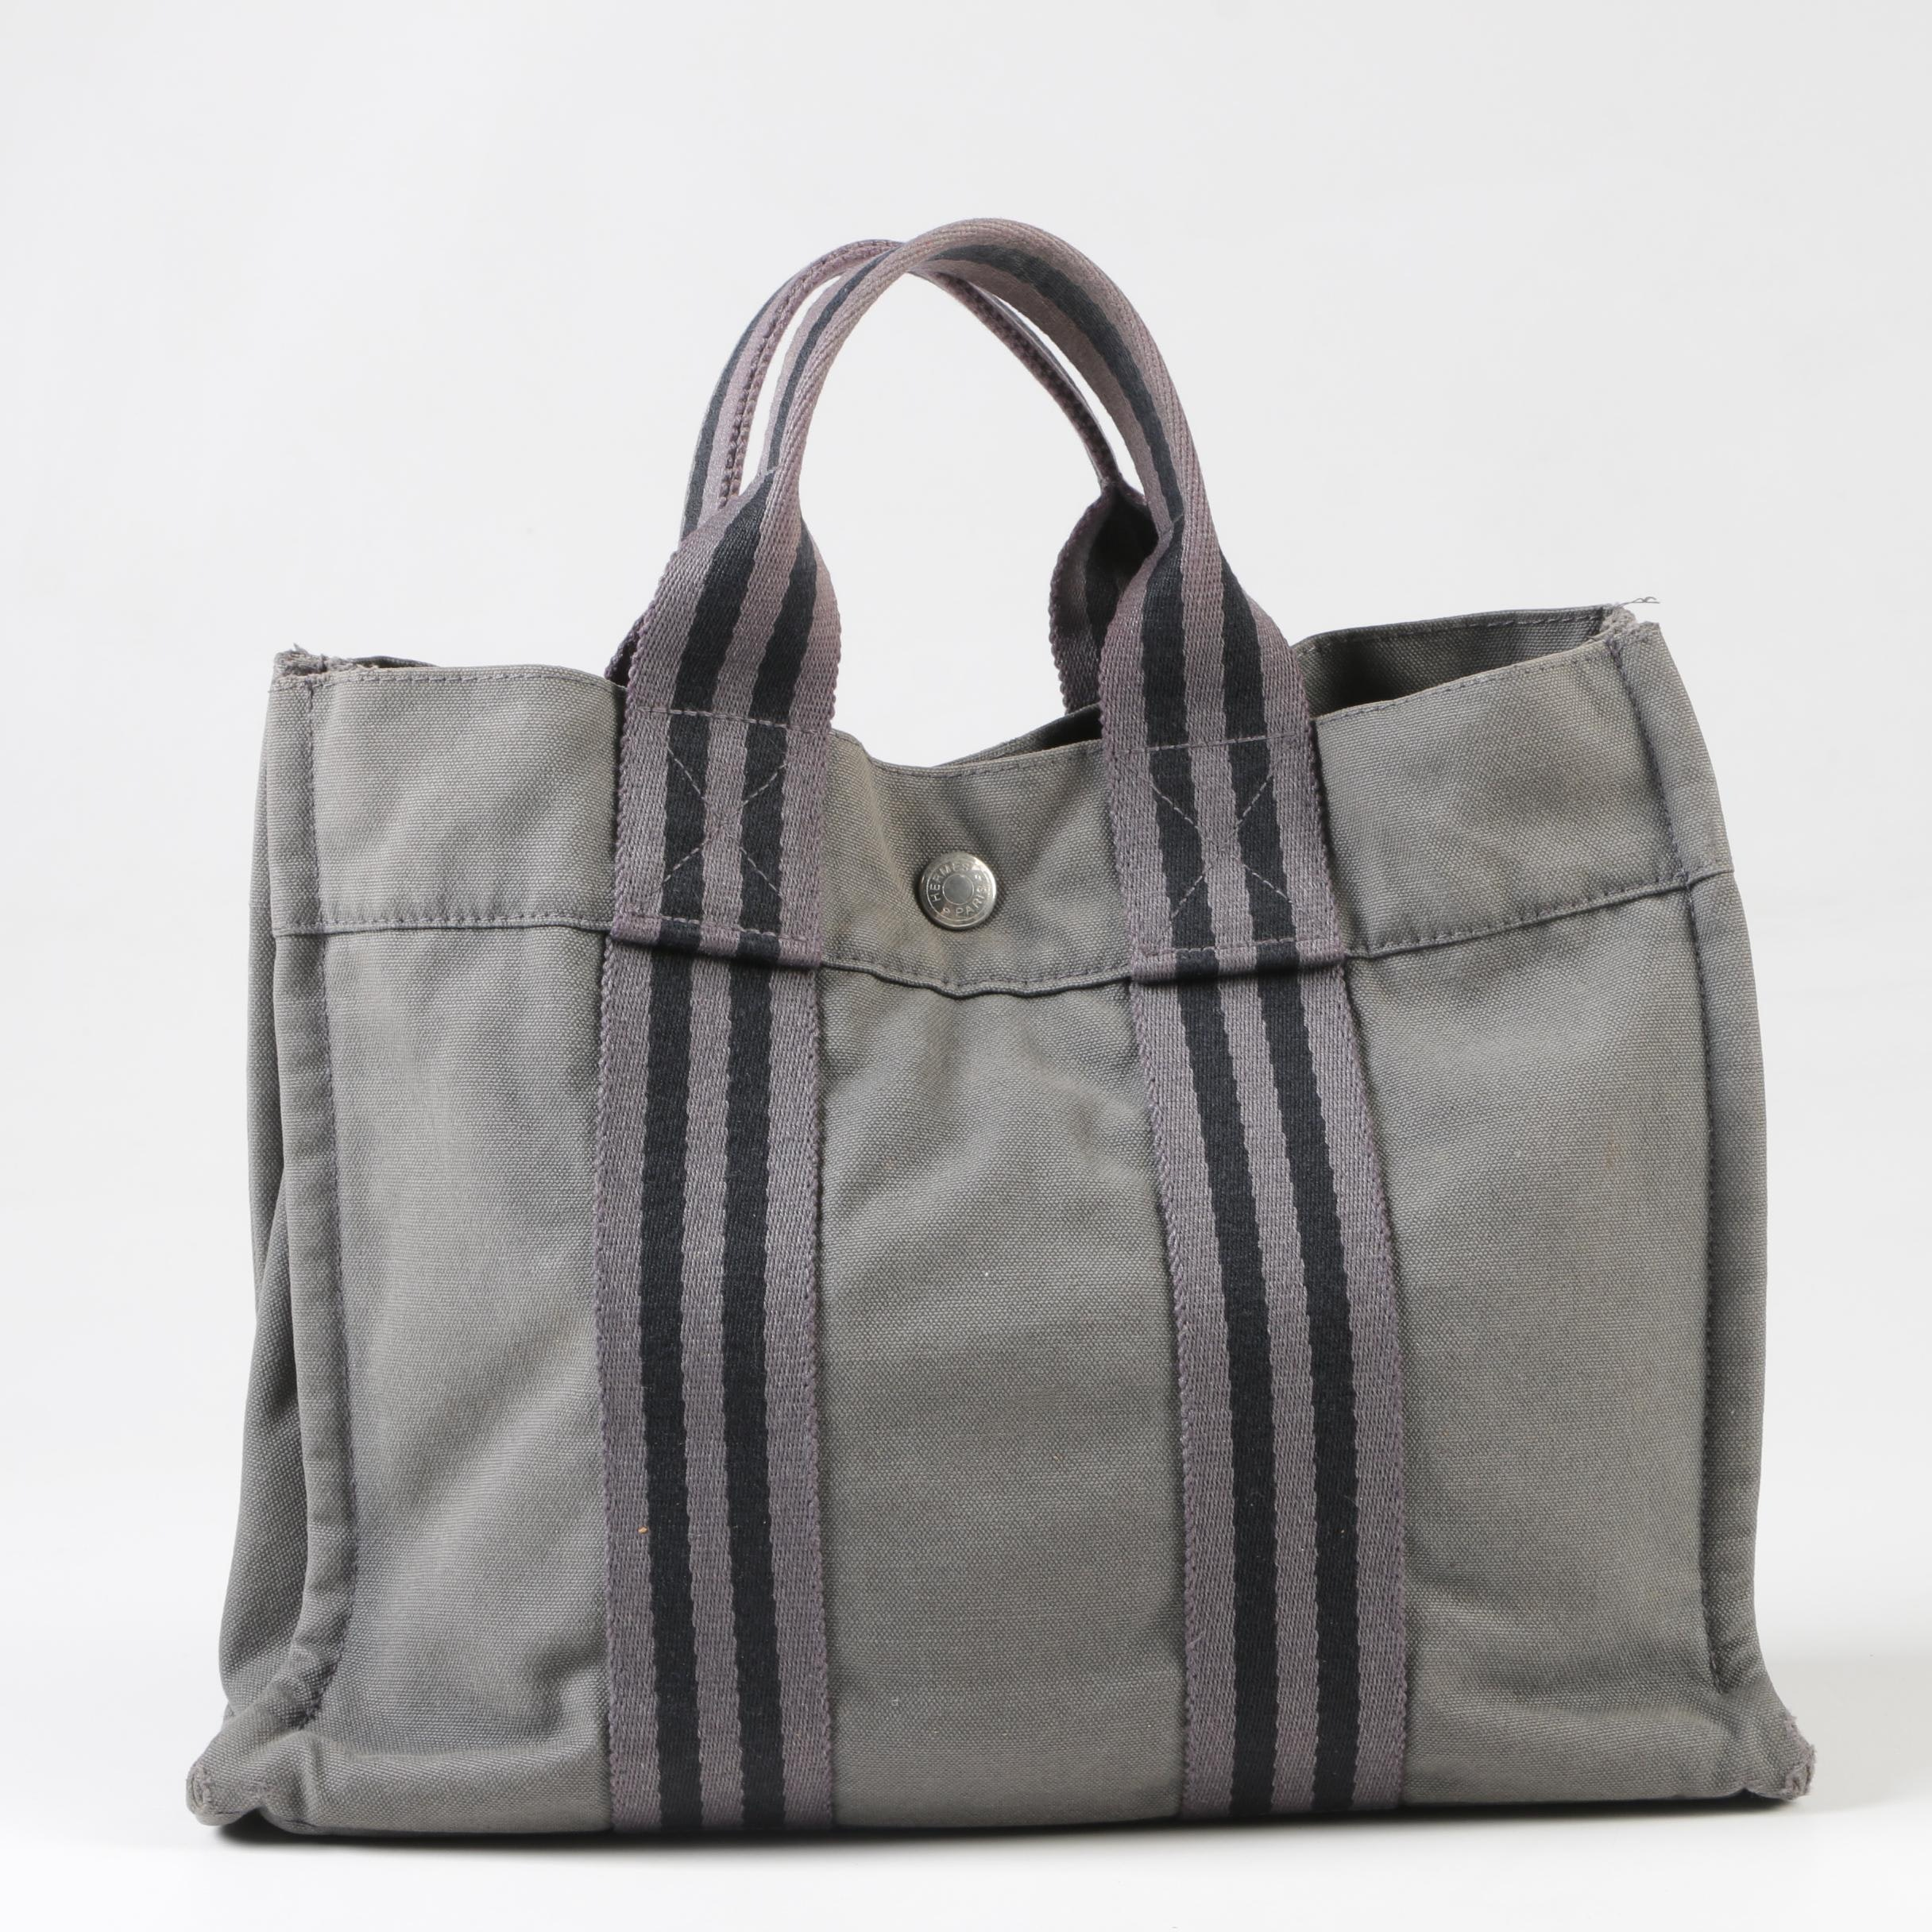 Hermès of Paris Grey and Black Canvas PM Tote